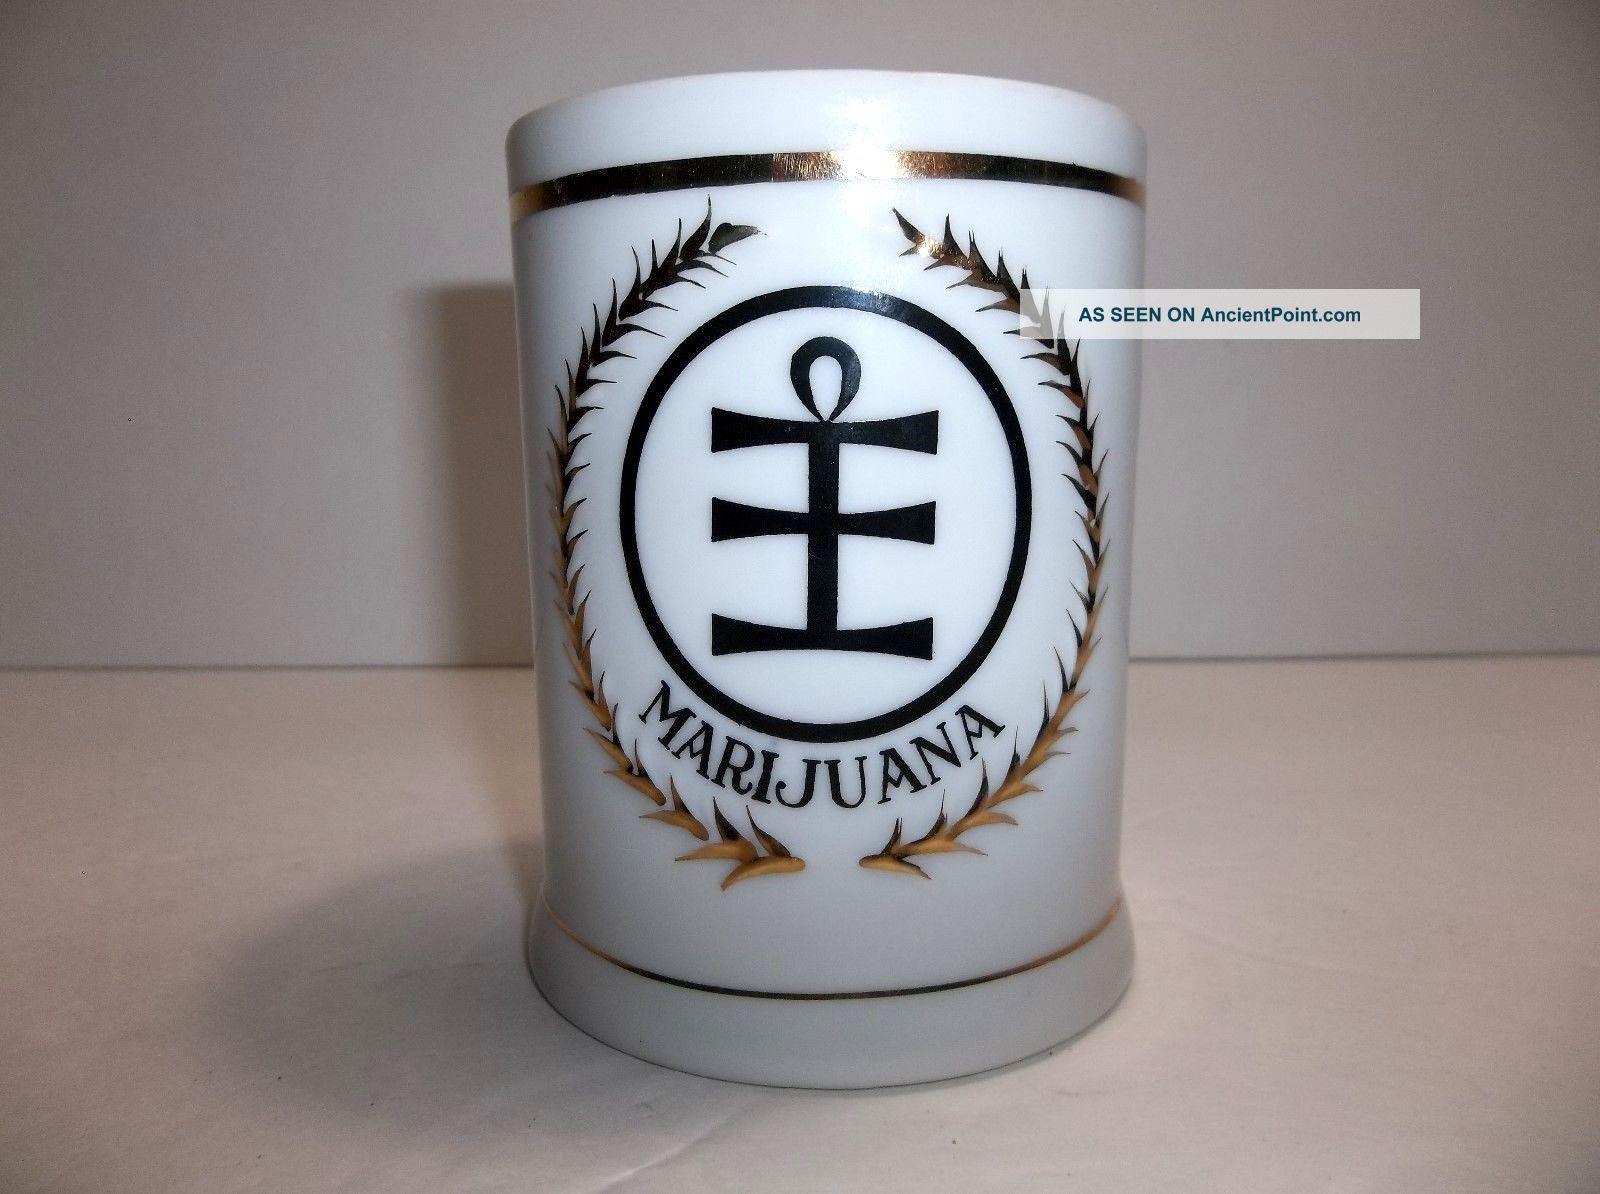 Vintage Freeman Lederman Marijuana Herb Porcelain Apothecary Jar Jars photo